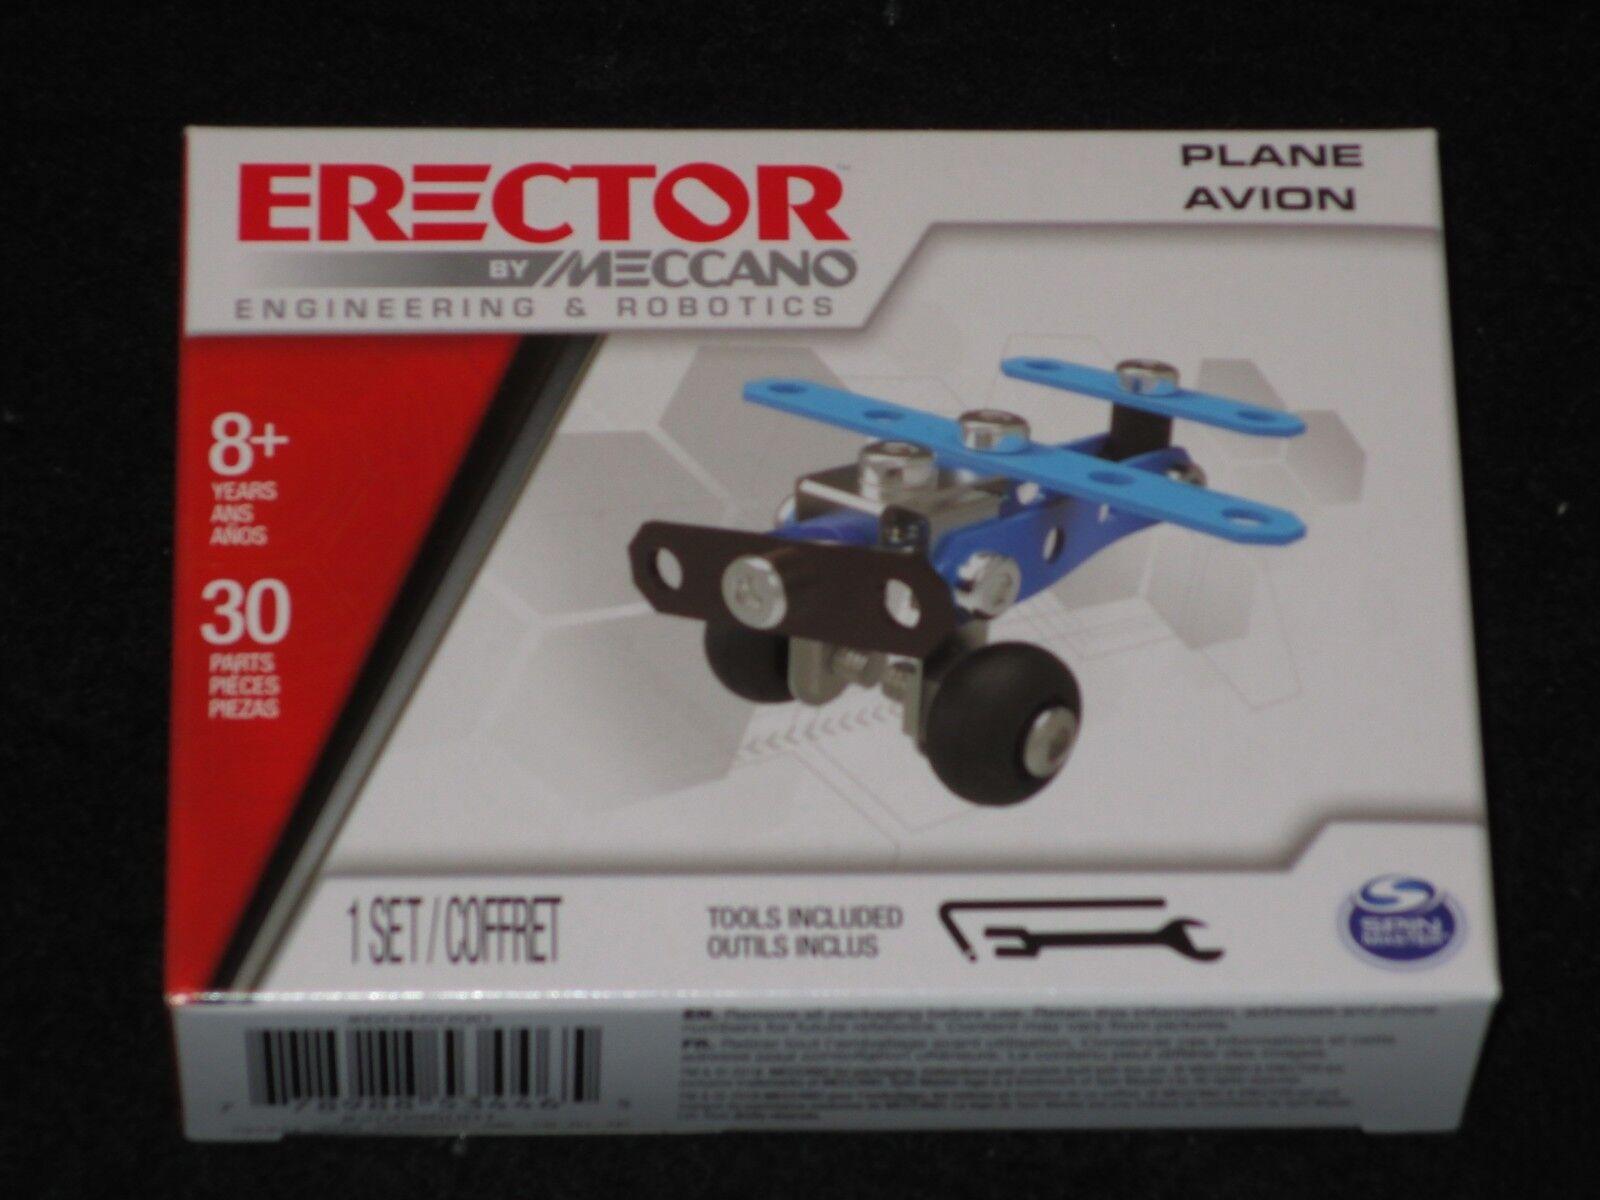 Erector by, Meccano - BLUE PLANE Metal Model Building Kit Bo